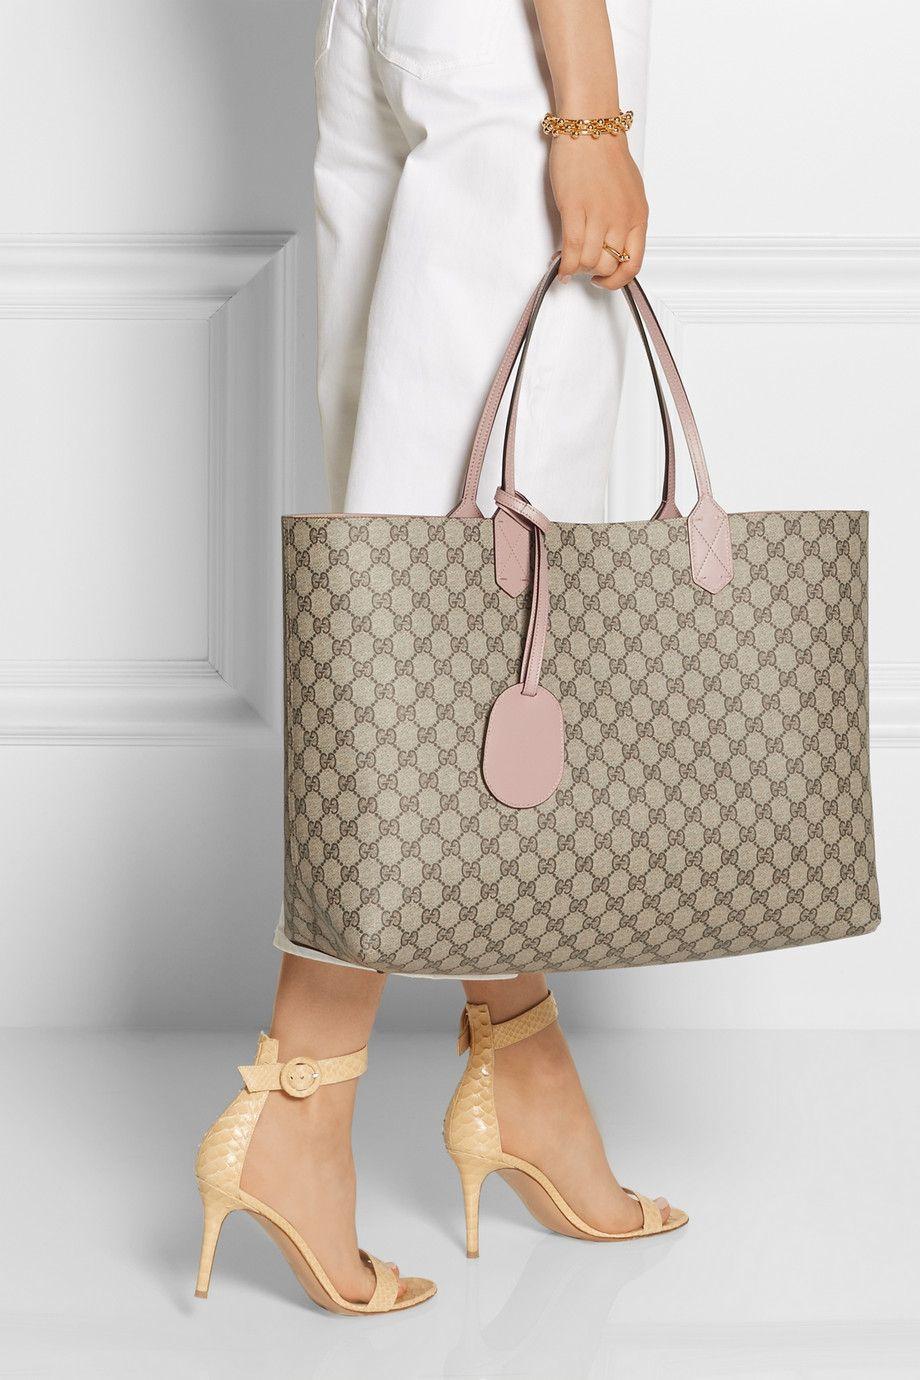 Gucci sac à main réversible en cuir collé turnaround large neta